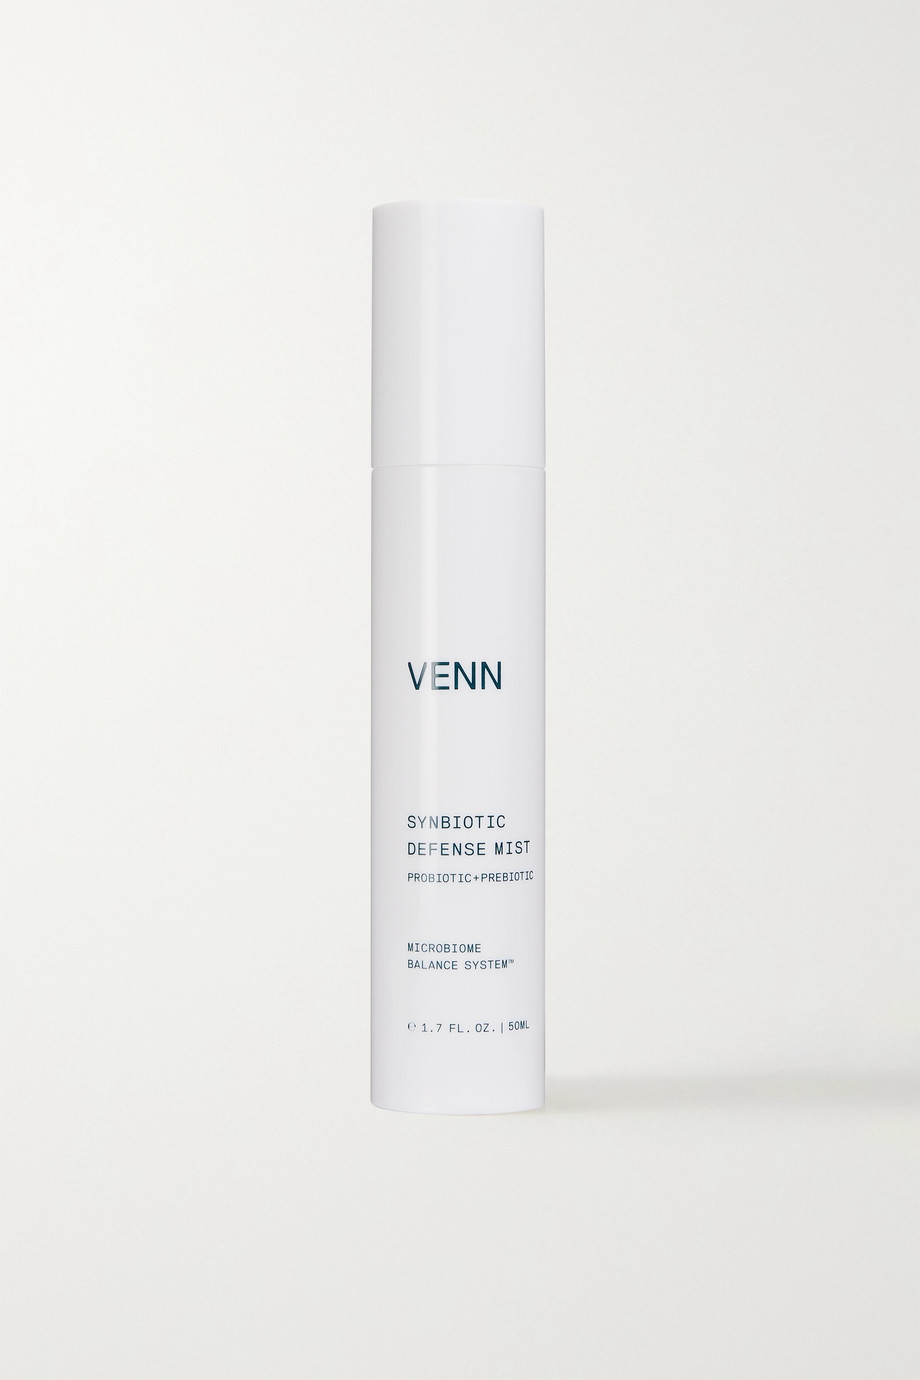 VENN Synbiotic Defense Mist, 50ml